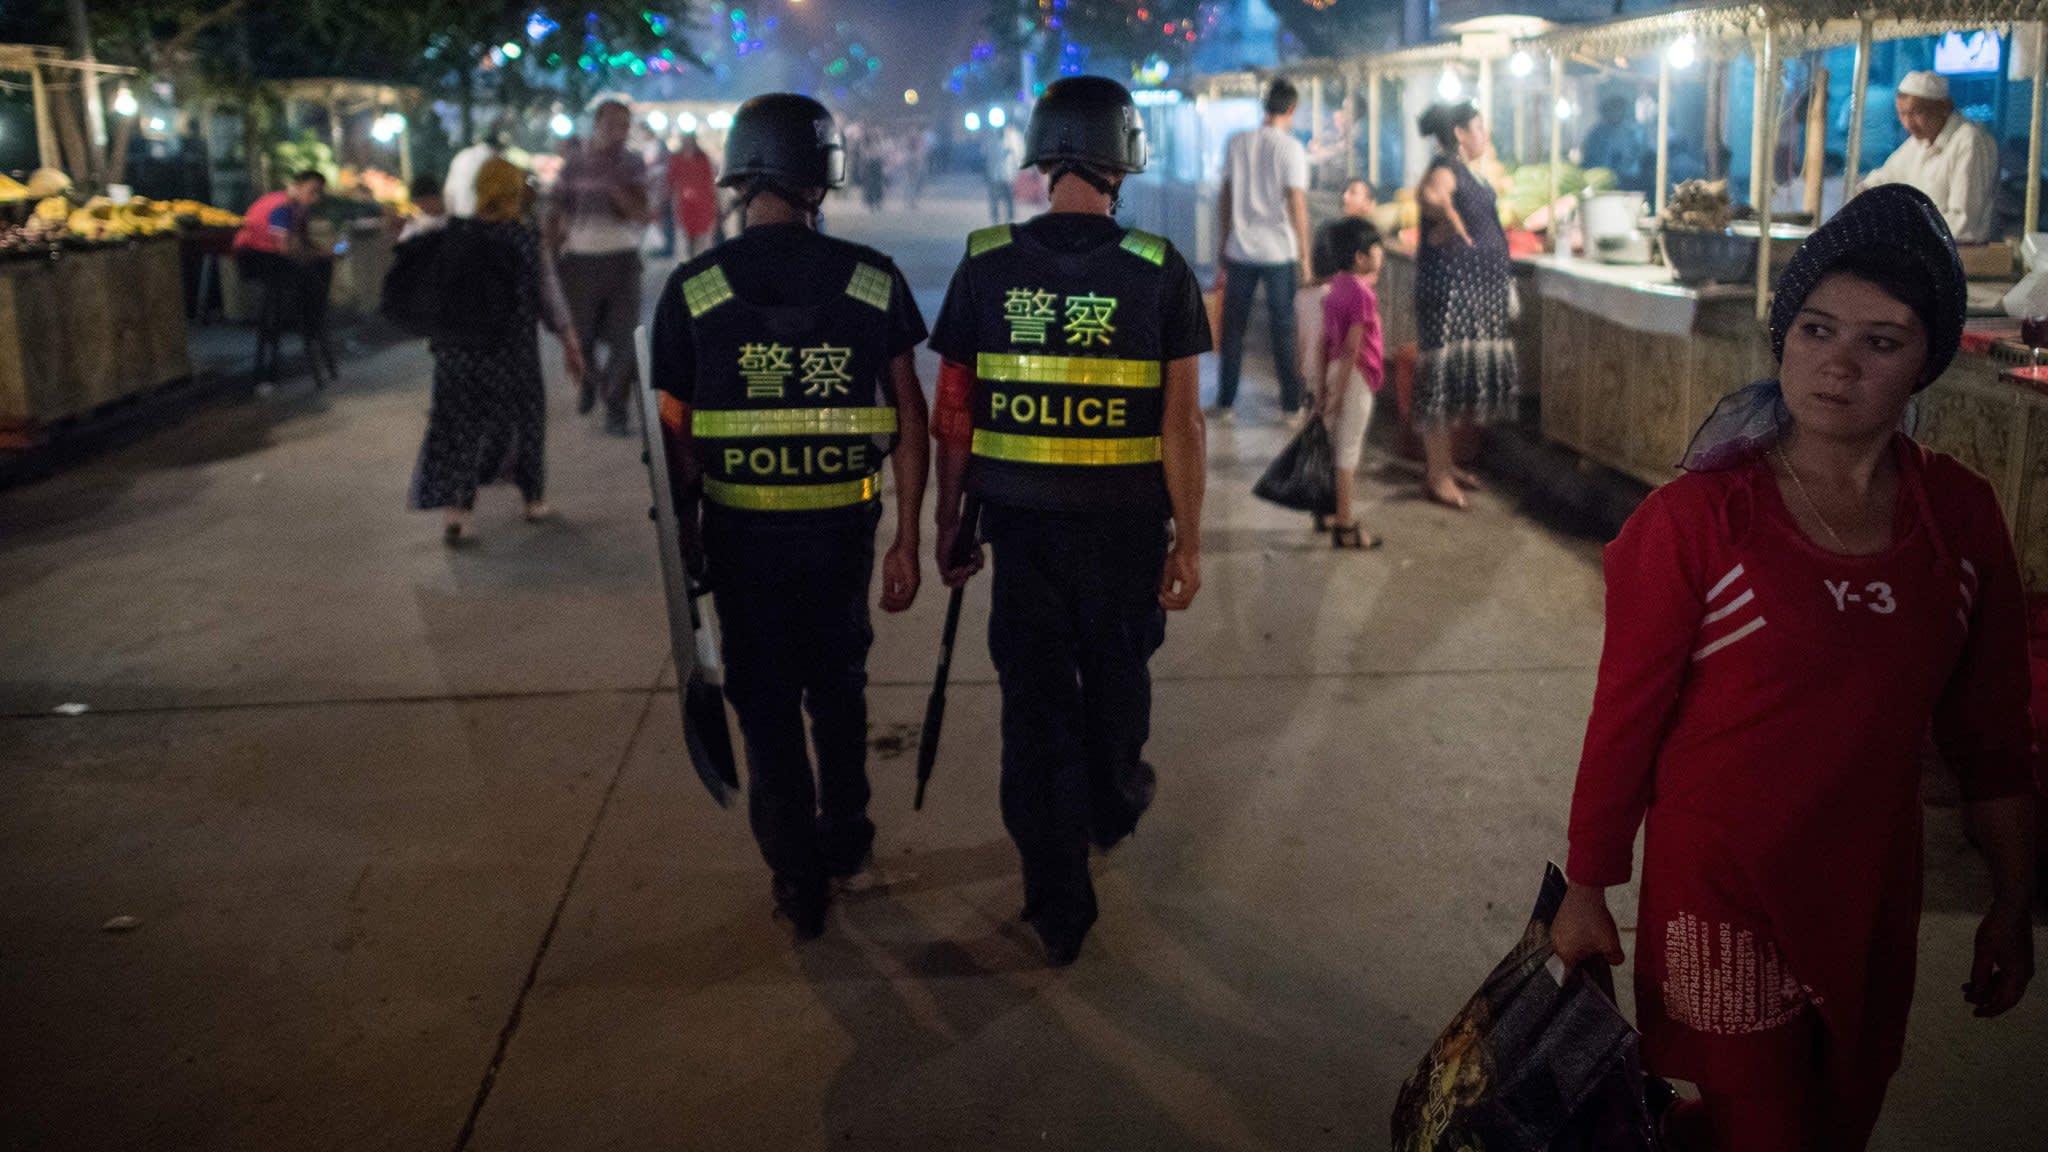 China denies UN allegations of Uighur internment centres